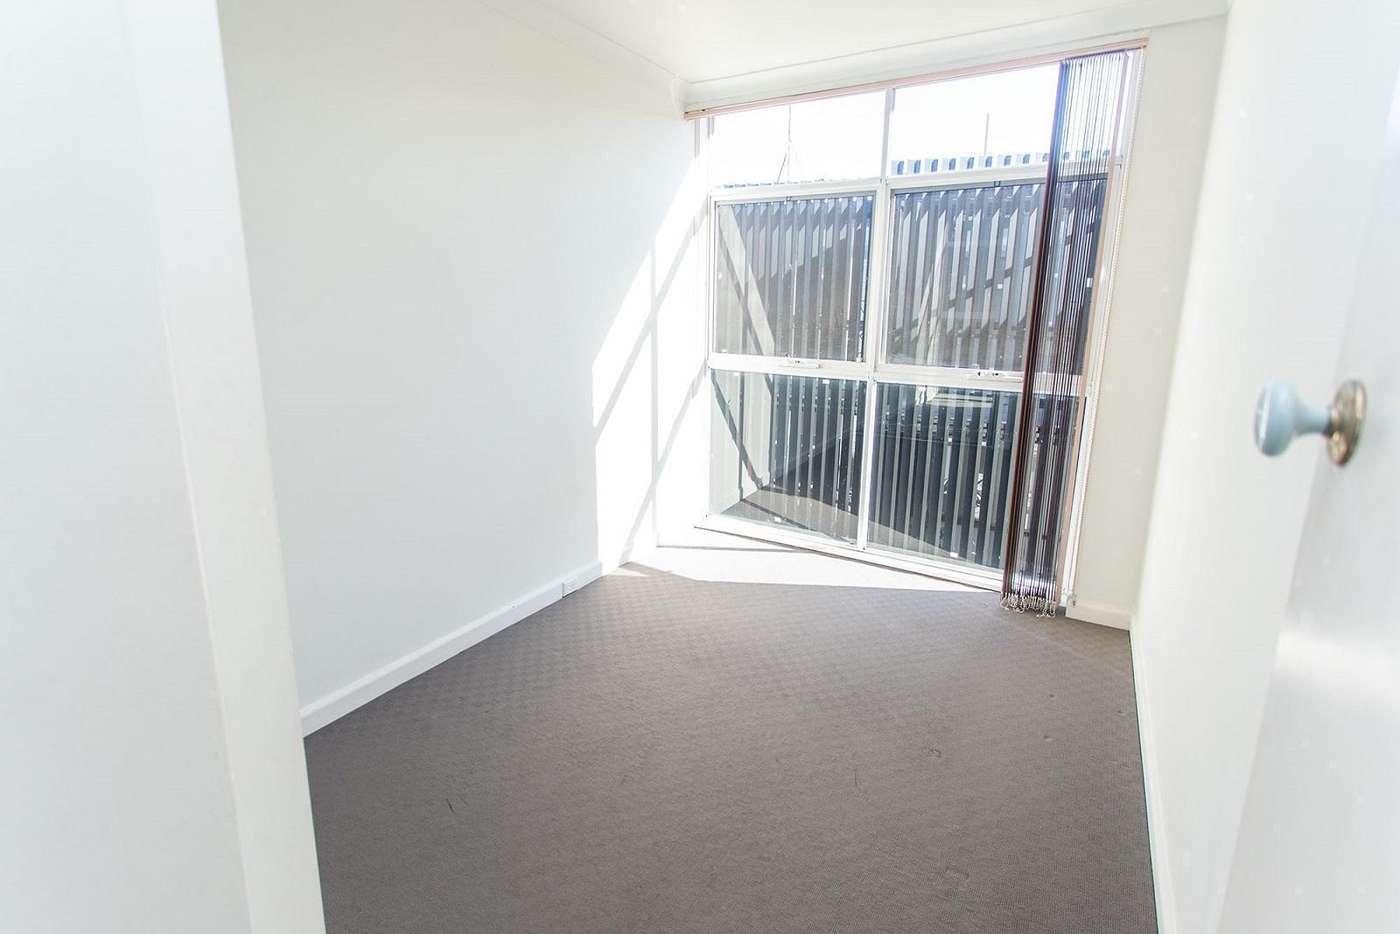 Sixth view of Homely apartment listing, 12/82 Pakington Street, St Kilda VIC 3182